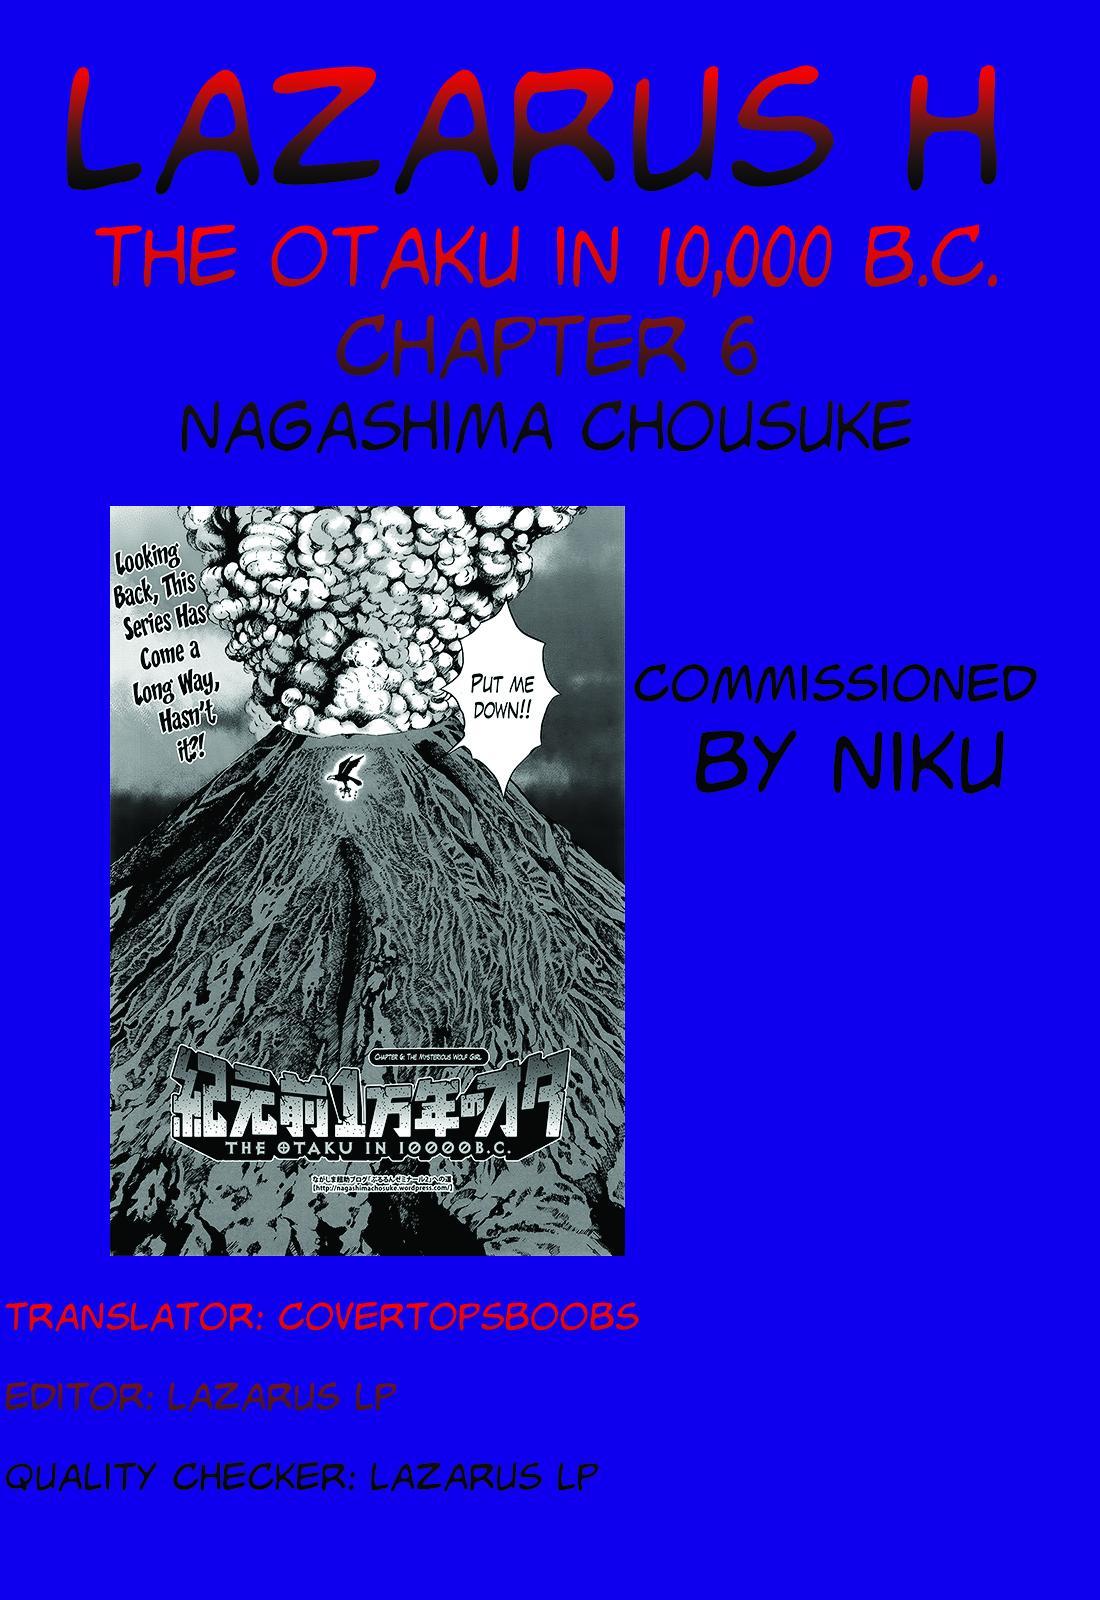 Kigenzen 10000 Nen no Ota | The Otaku in 10,000 B.C. 117